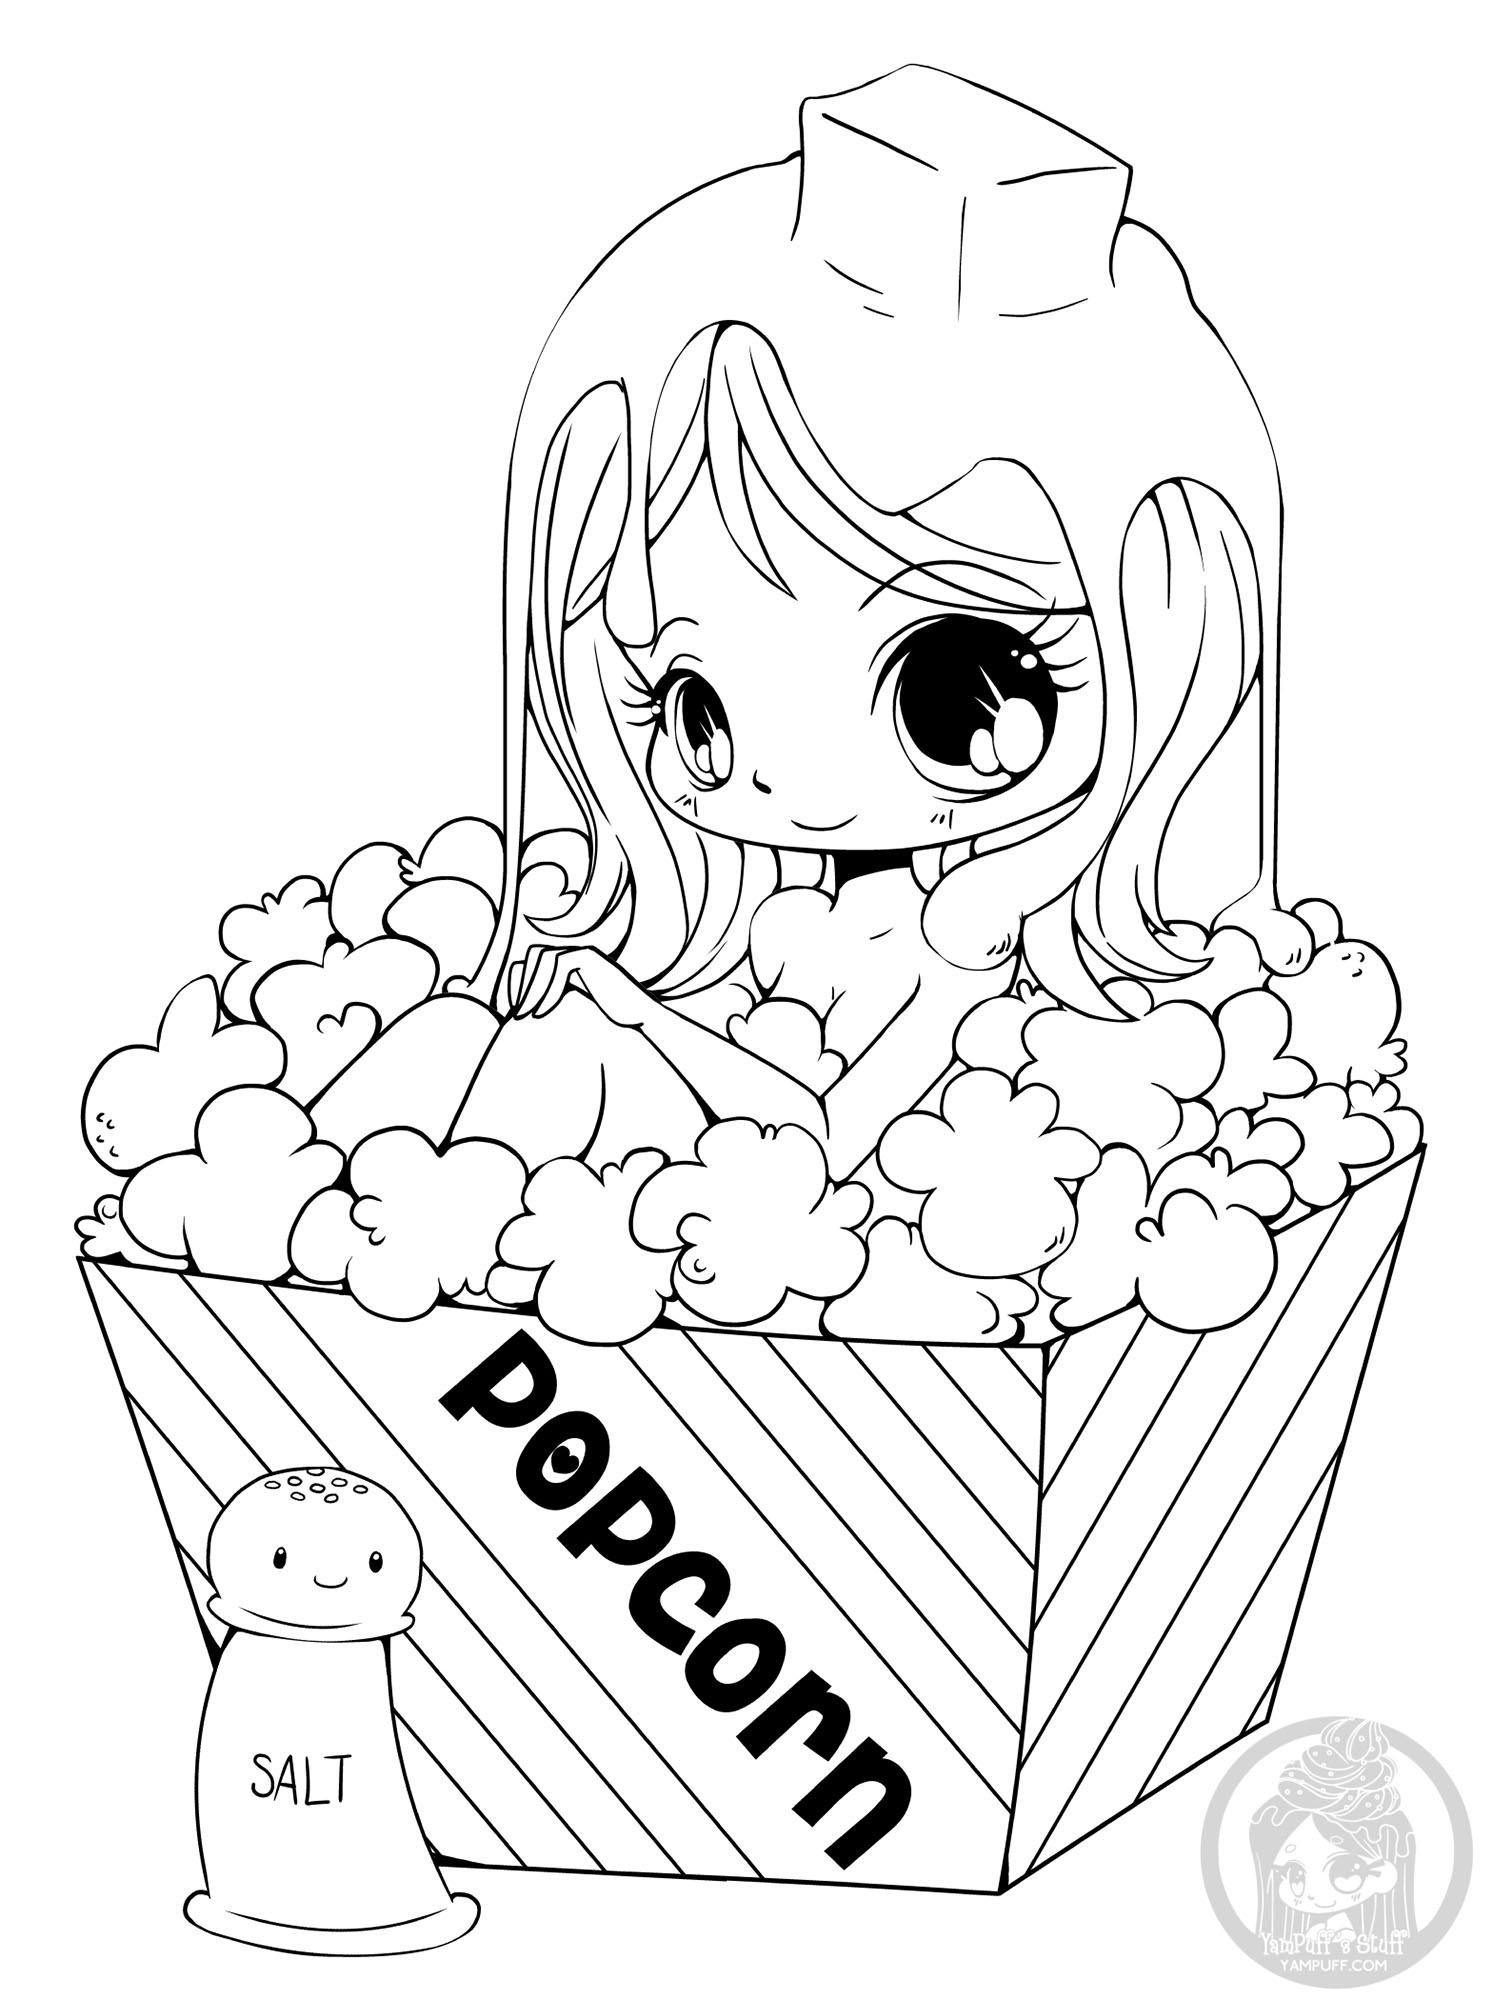 Fille Popcorn Yampuff - Coloriage Kawaii - Coloriages Pour tout Coloriage Kawaii A Imprimer